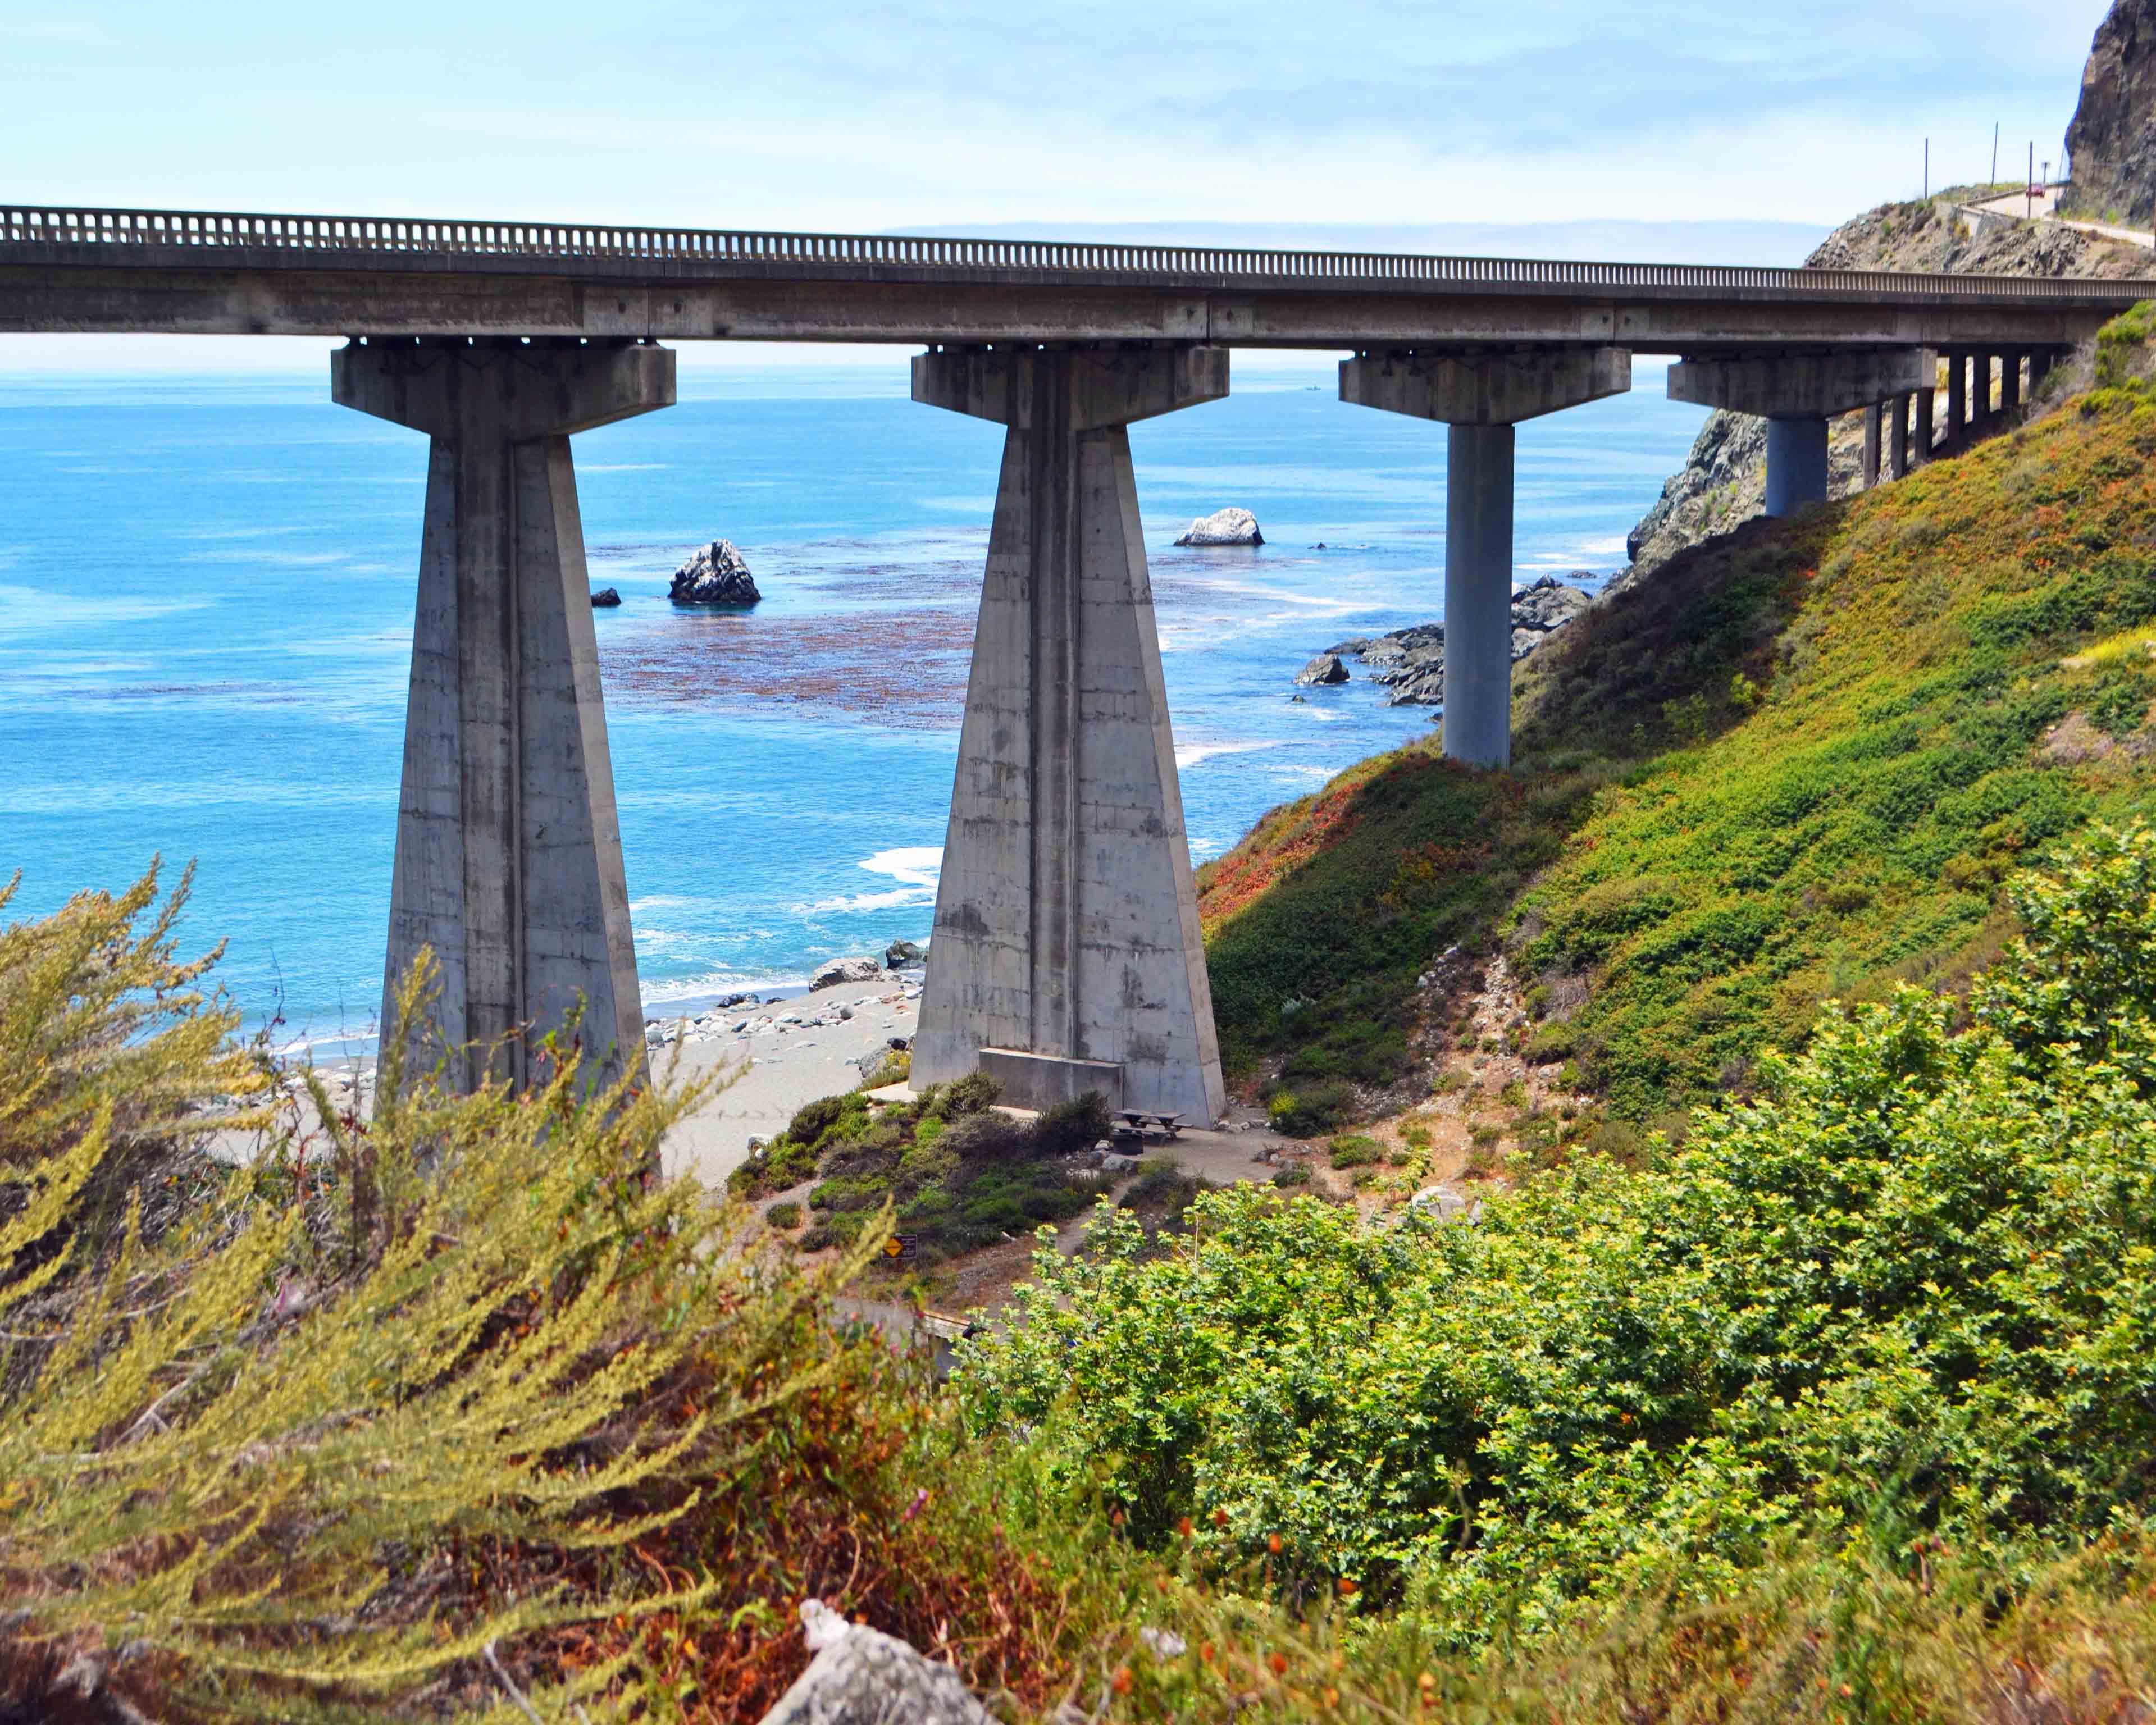 California Pacific Coast Highway 1 Road Trip Guide